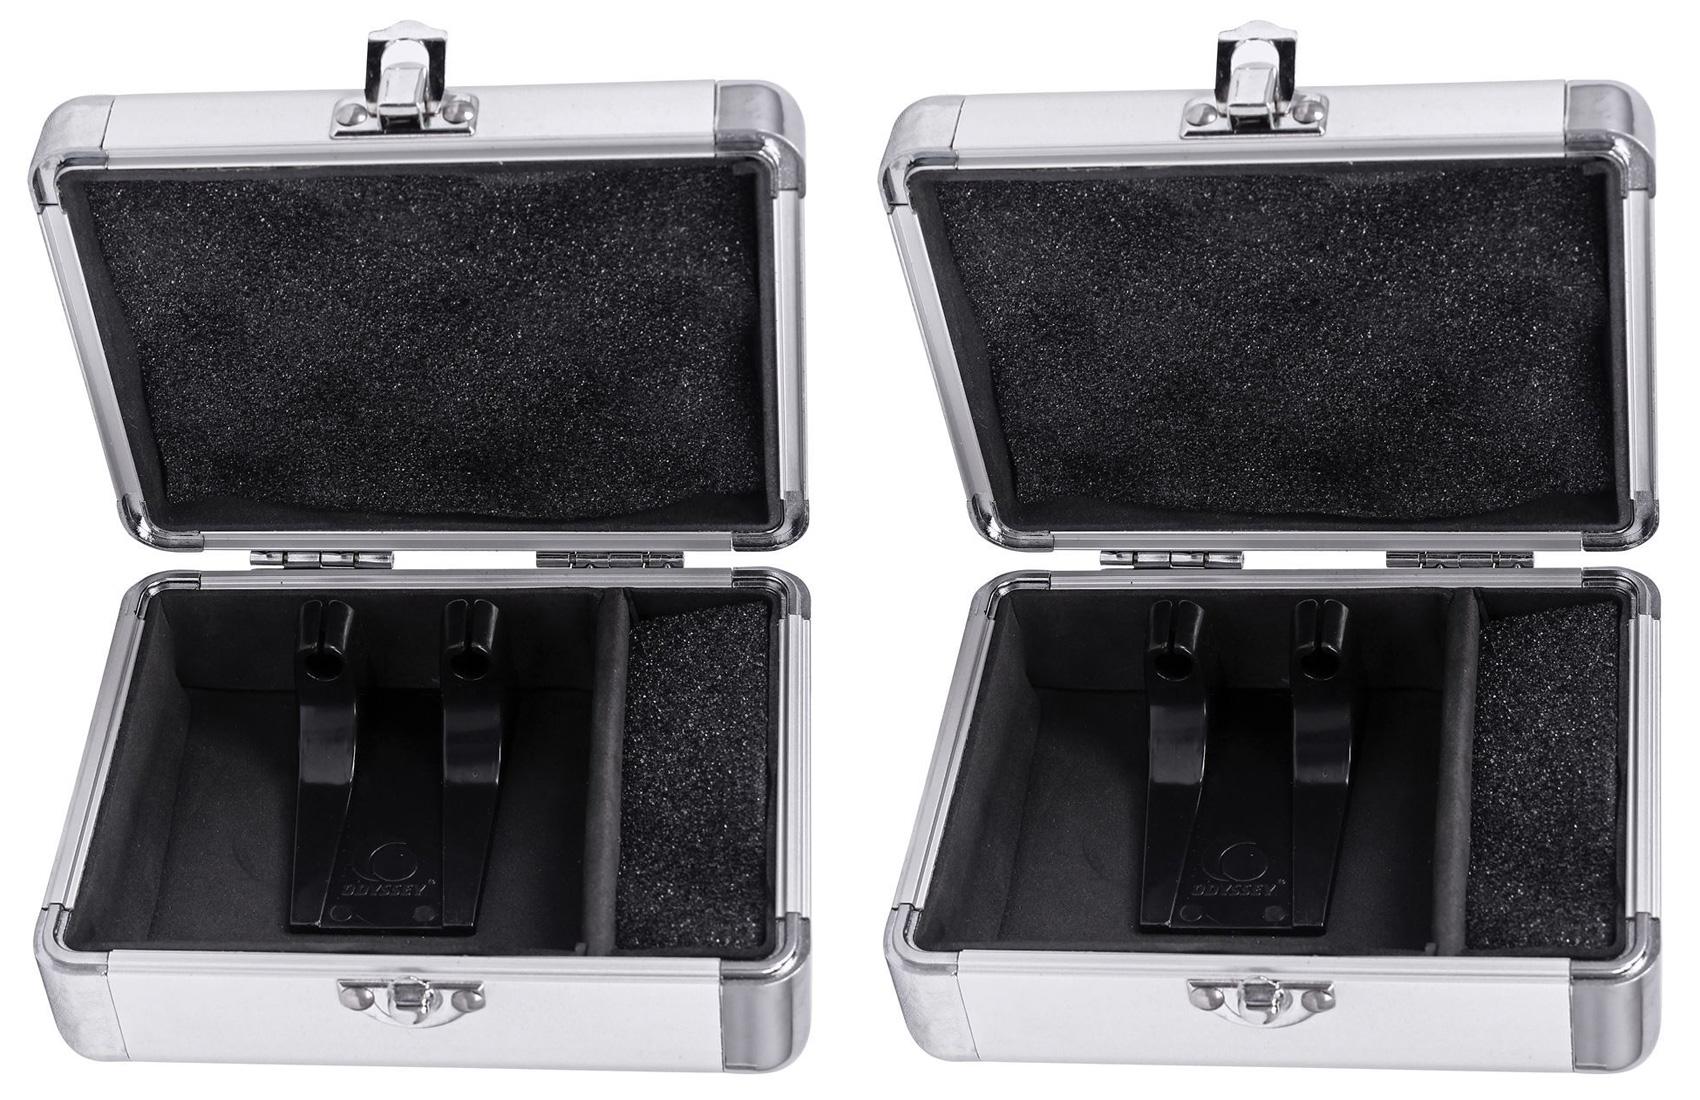 2) Odyssey KCC2PR2SL KROM PRO2 2x Turntable Needle Cartridge Travel Cases SIlver by Odyssey